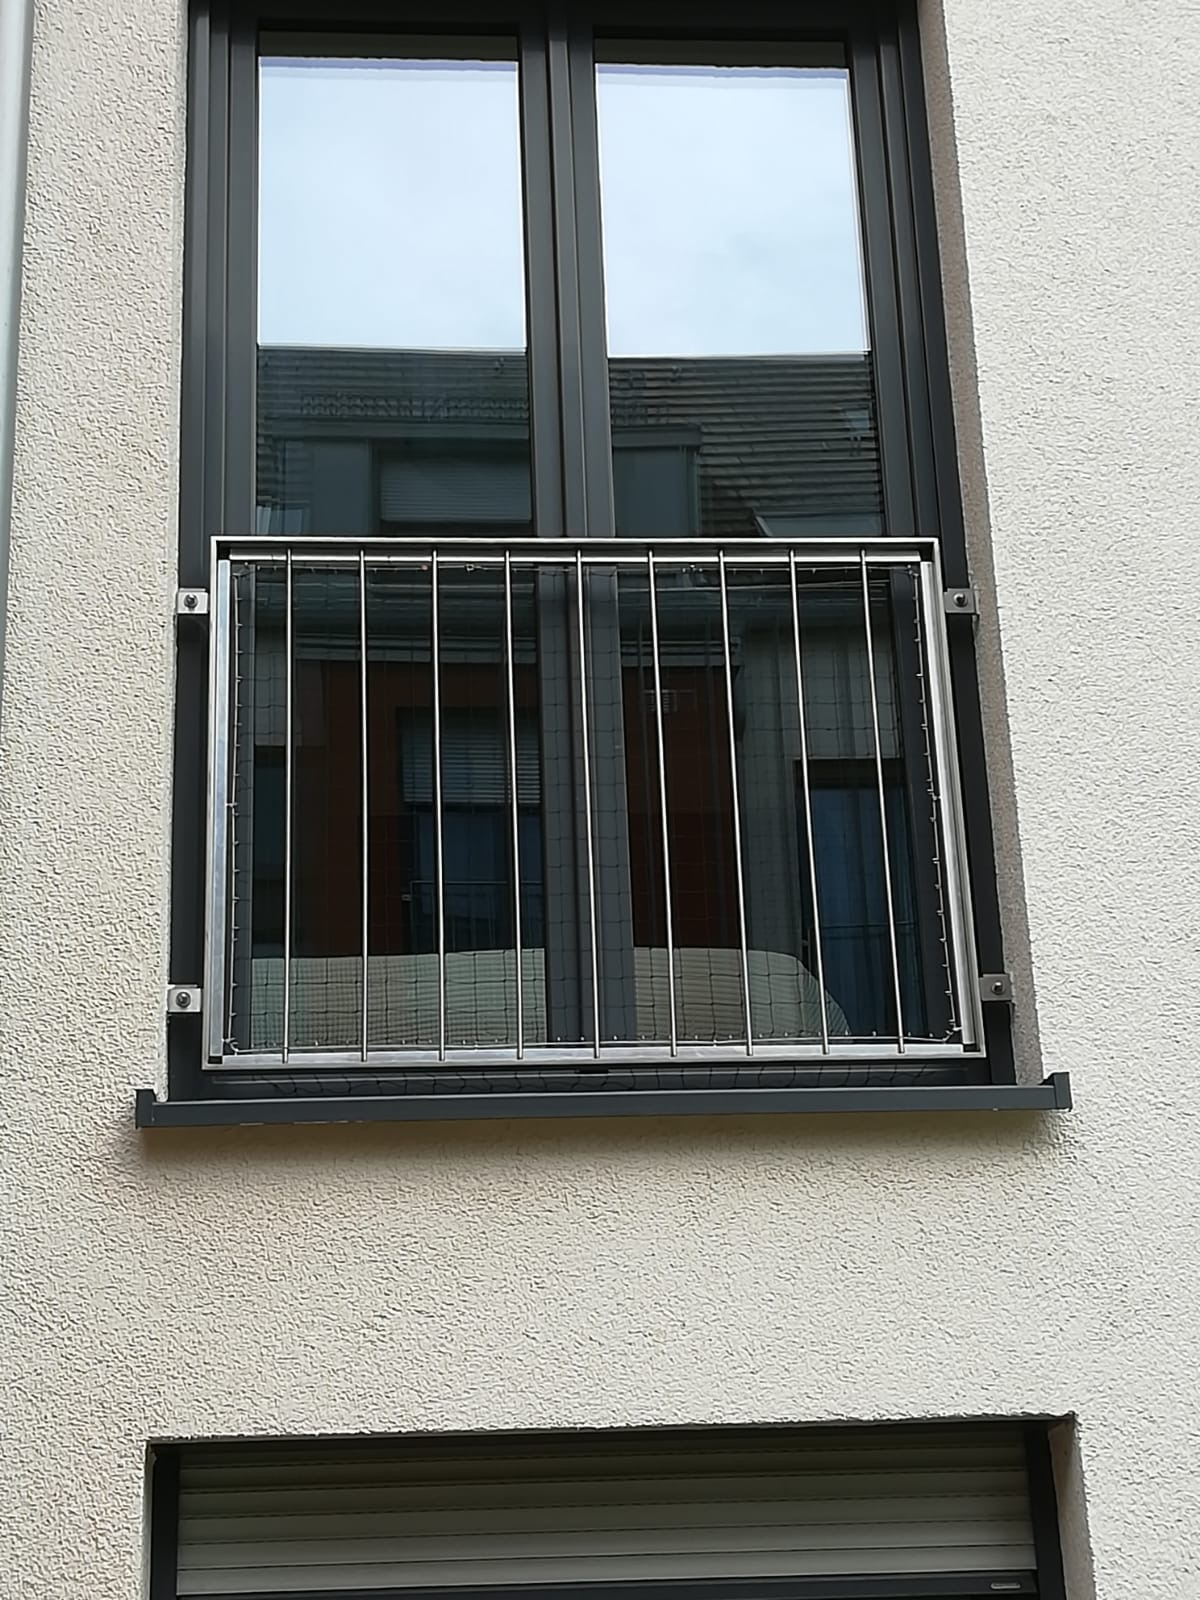 Katzenschutznetze am Fenster